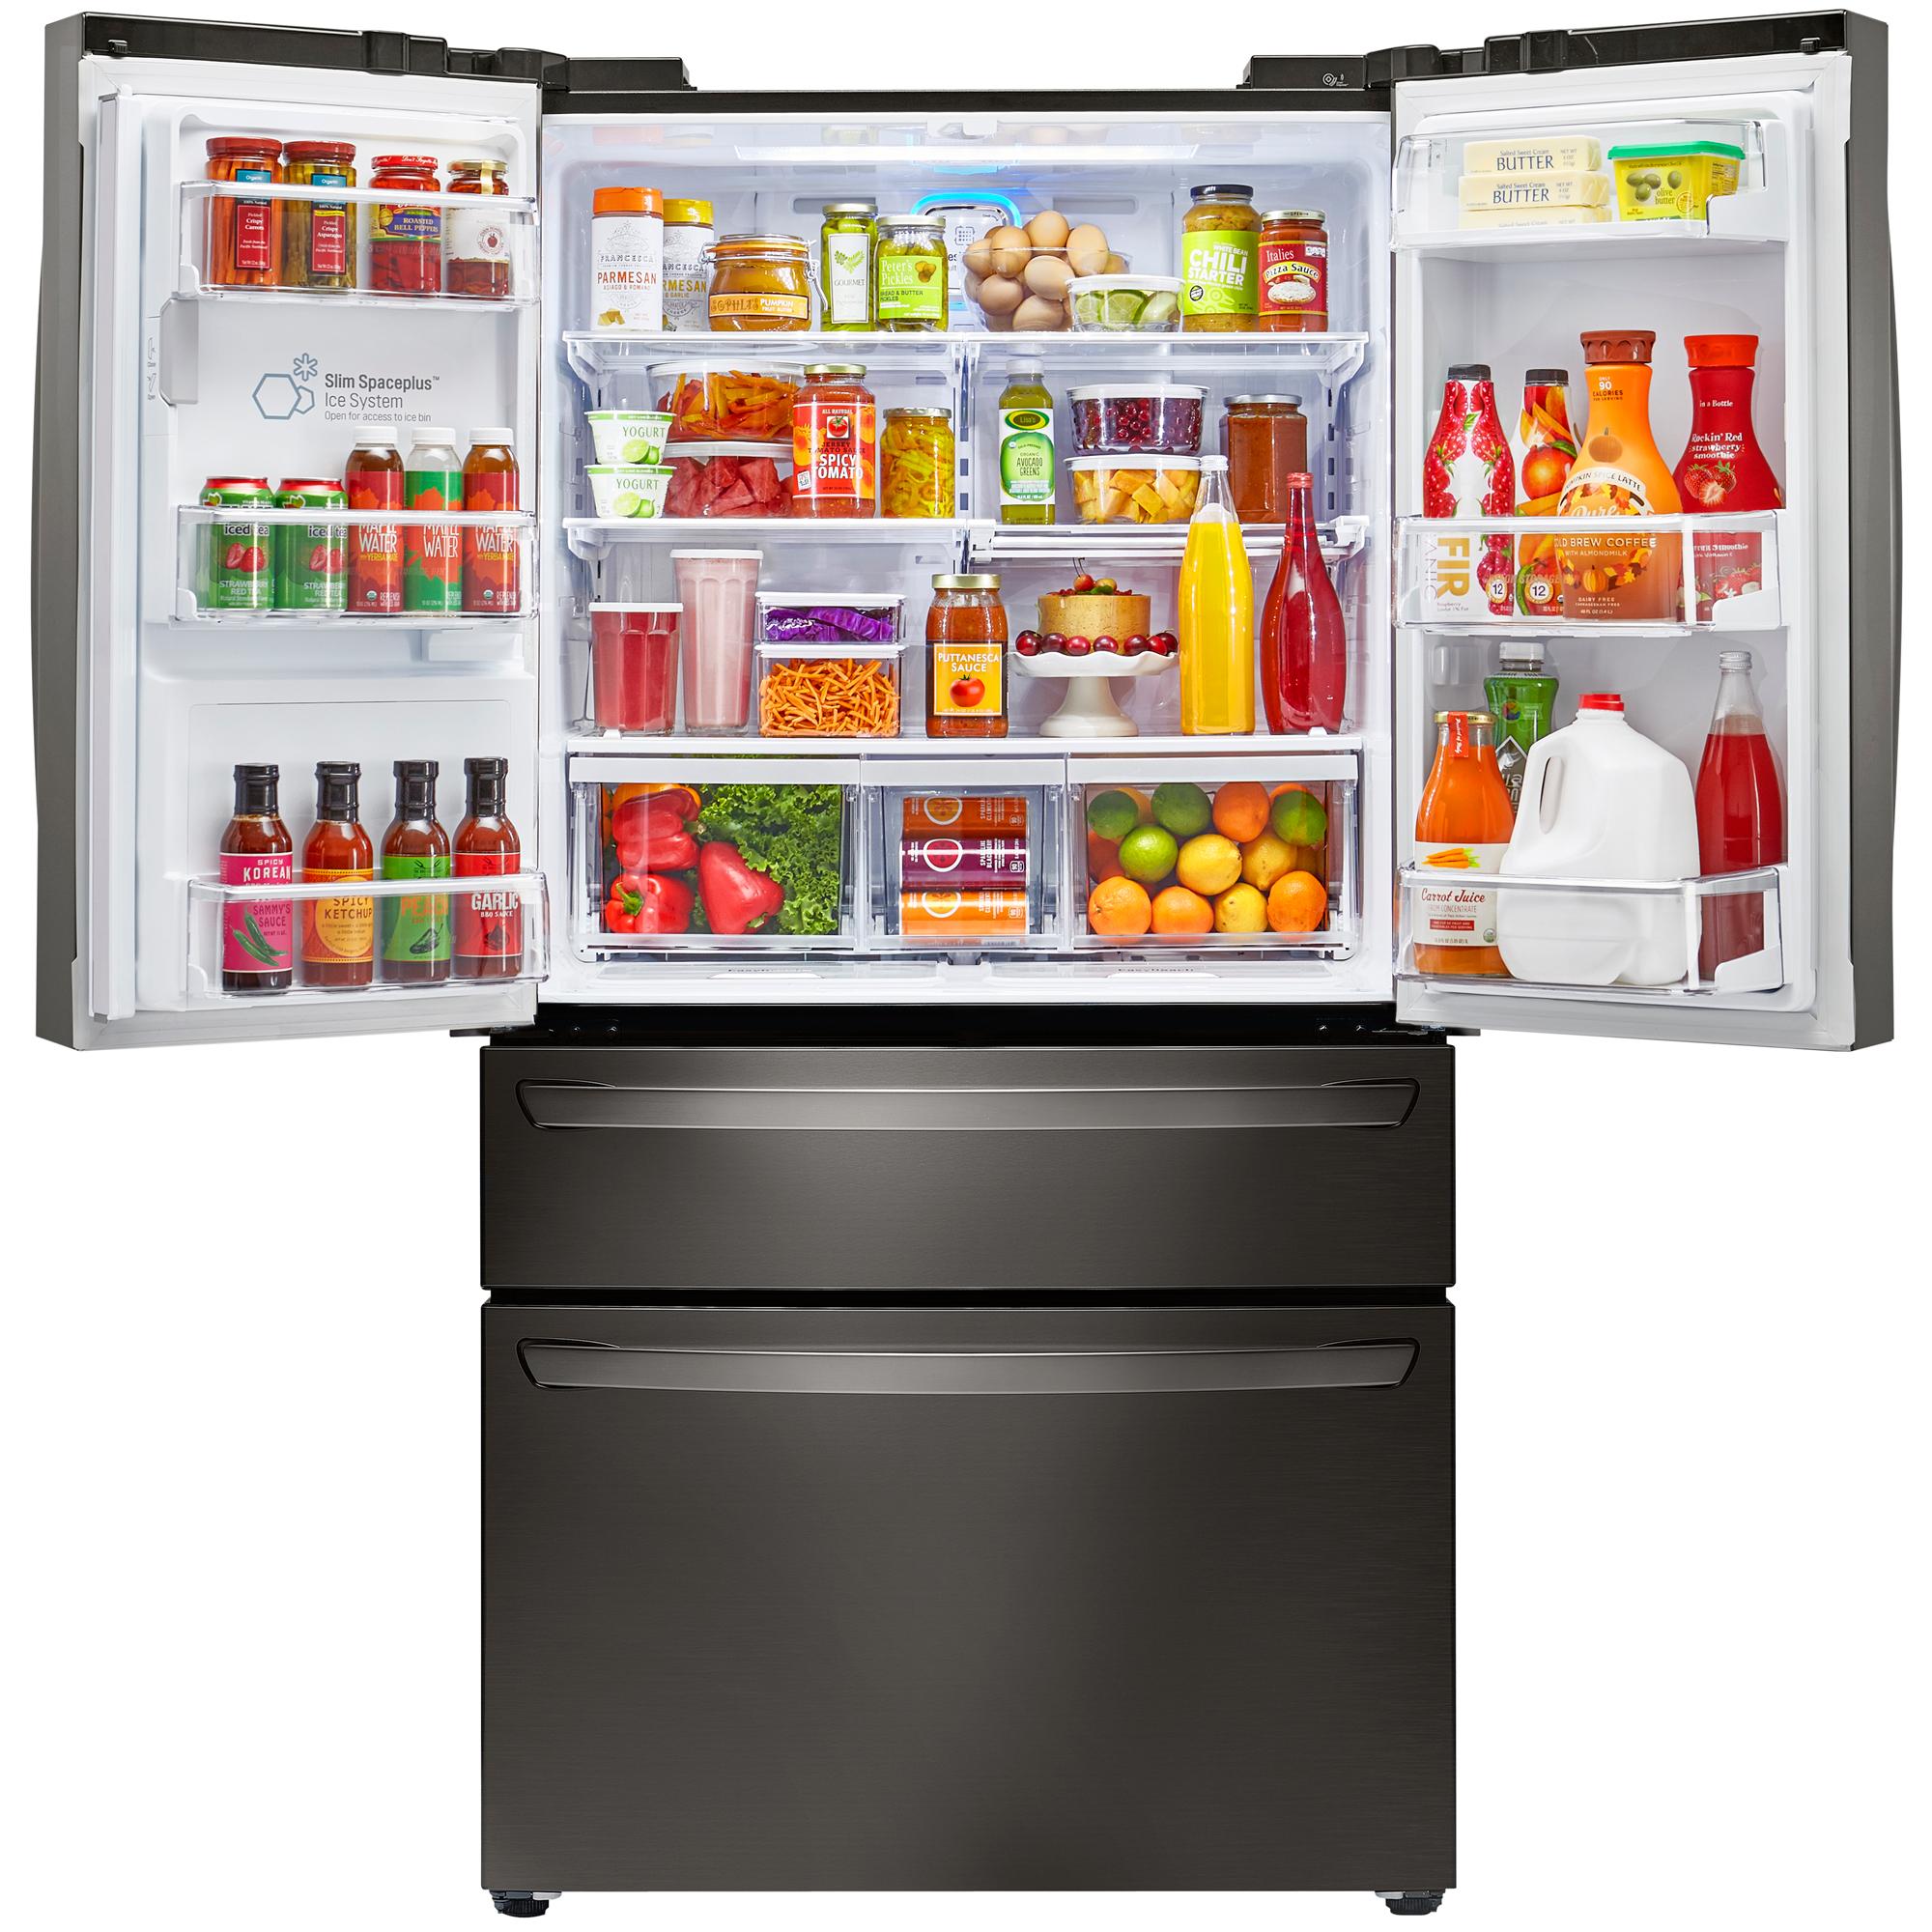 LG LMXC23746D 22.7 cu.ft. Counter-Depth 4-Door Refrigerator w/ CustomChill™ Drawer – Black Stainless